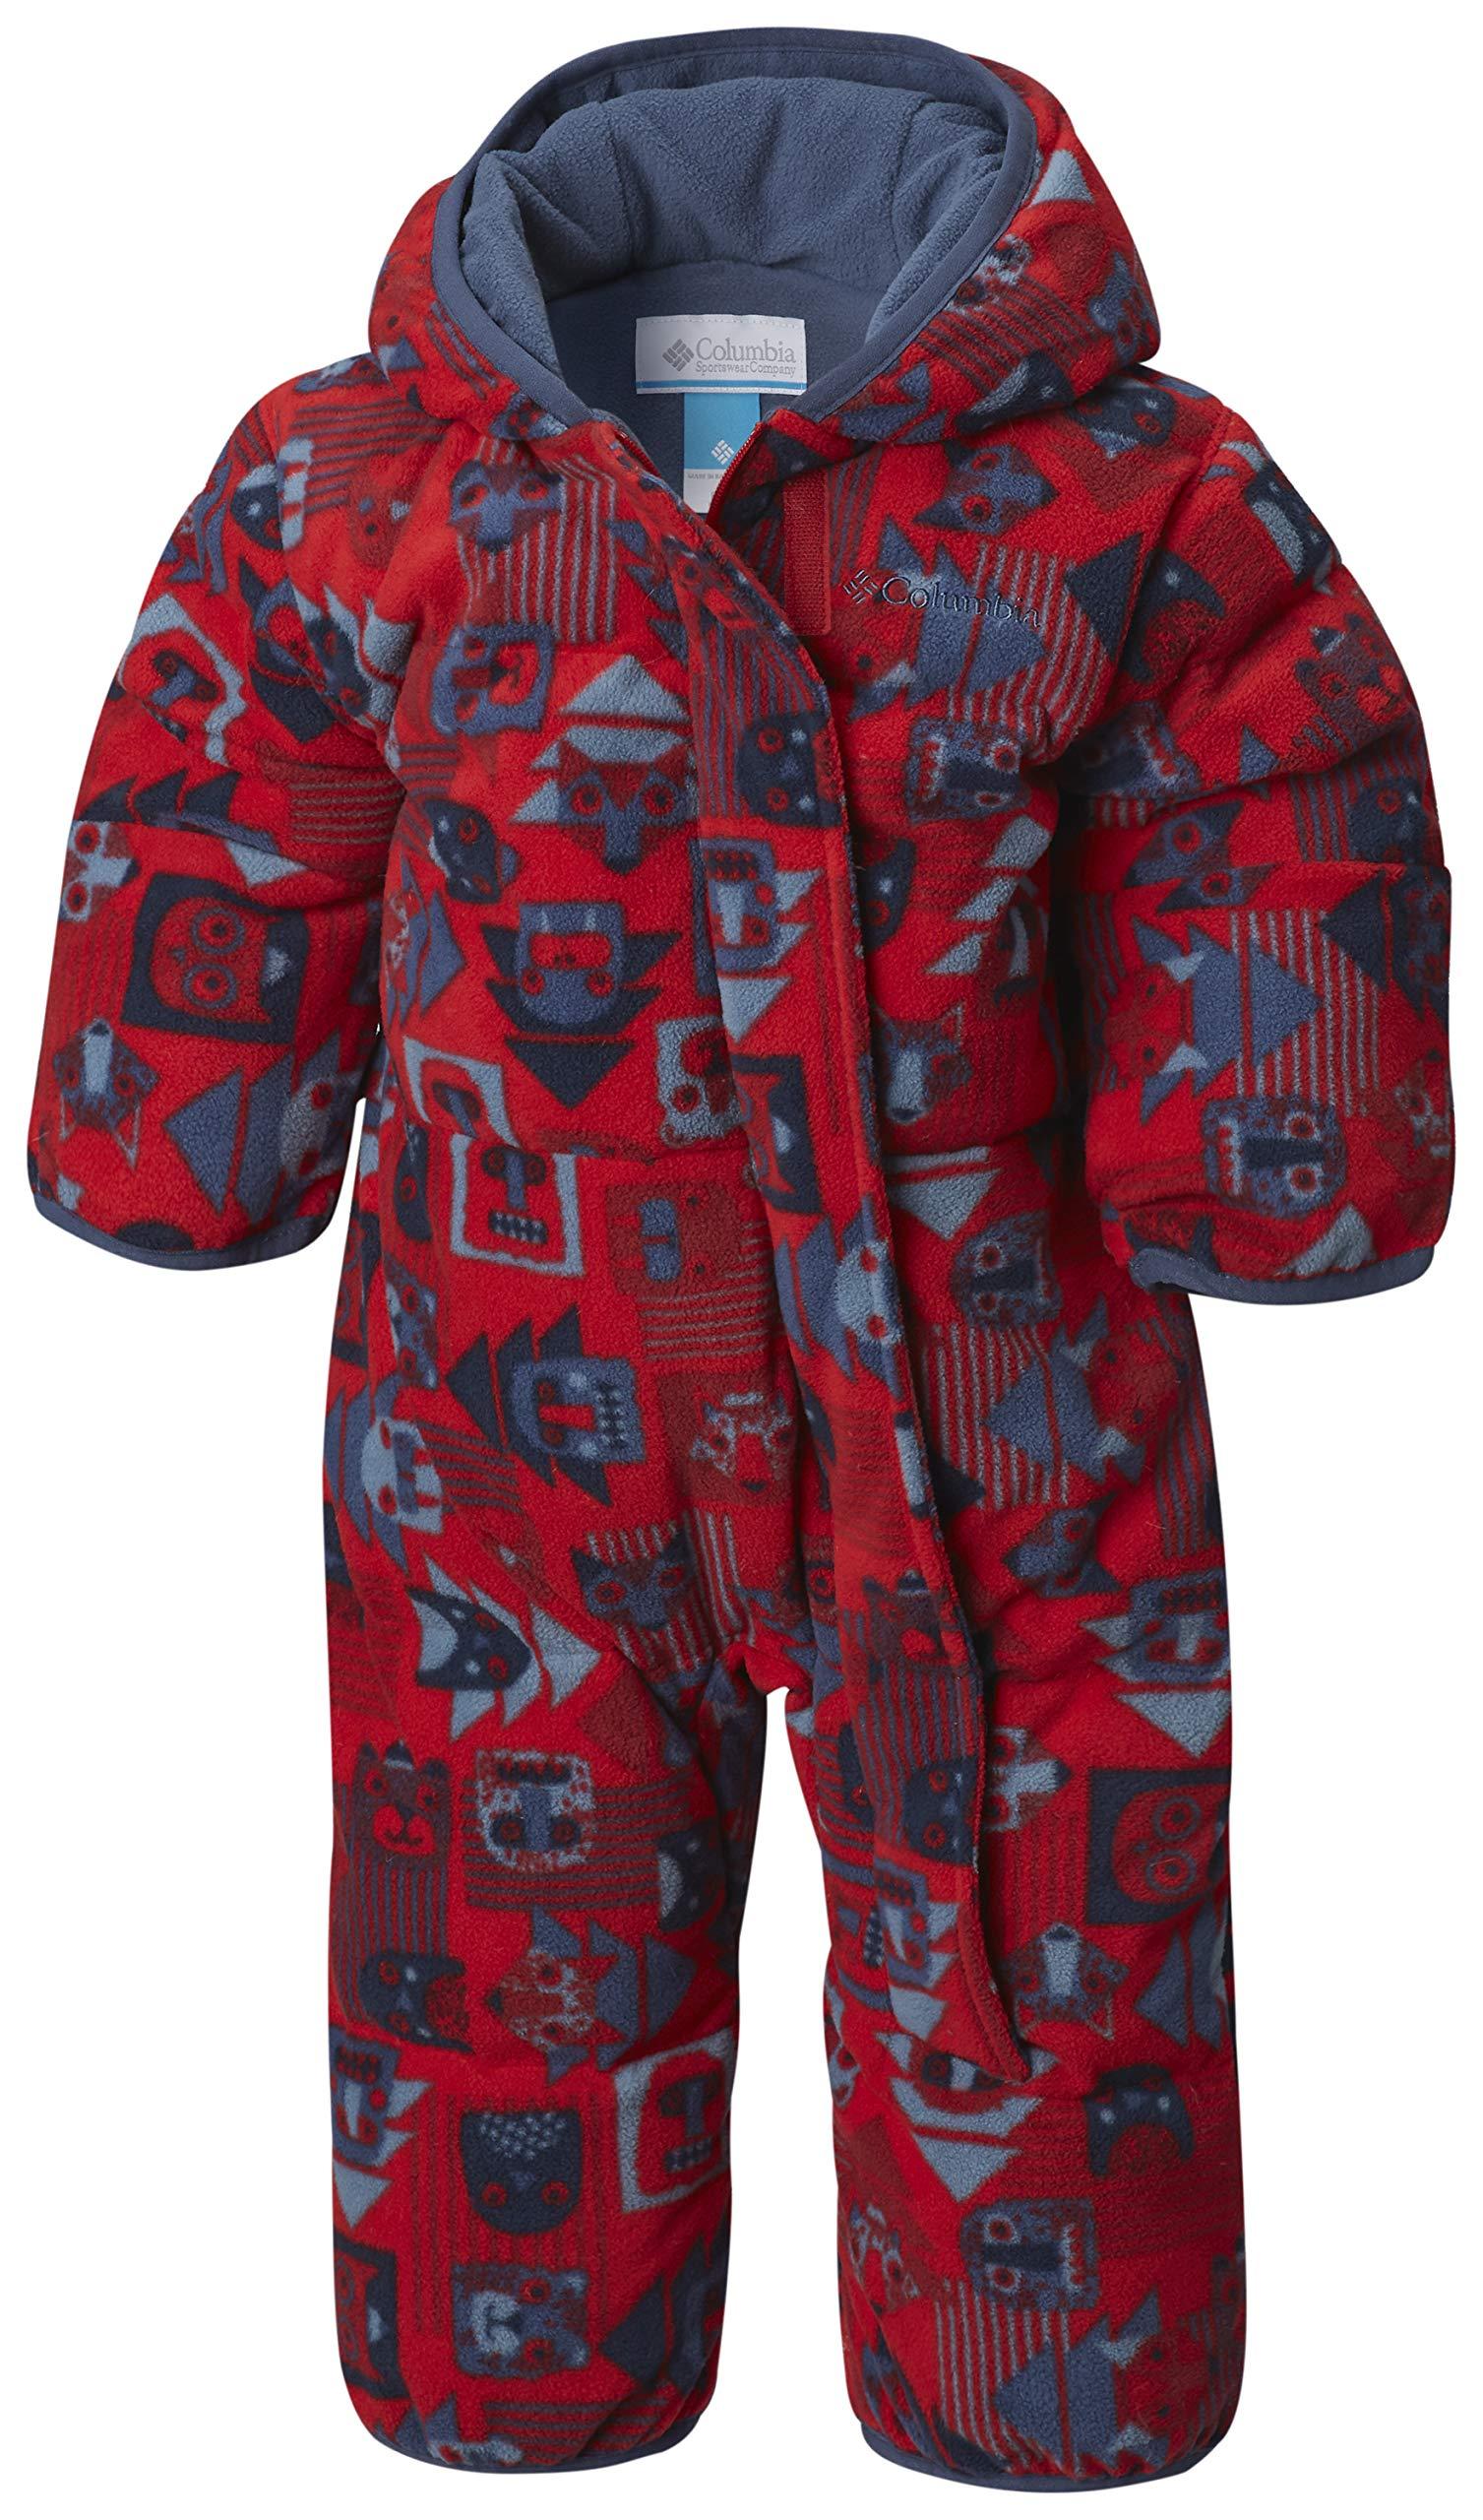 2e244e4289598 Columbia Snuggly - Bunny - Bunting - Polaire - Mixte bébé product image